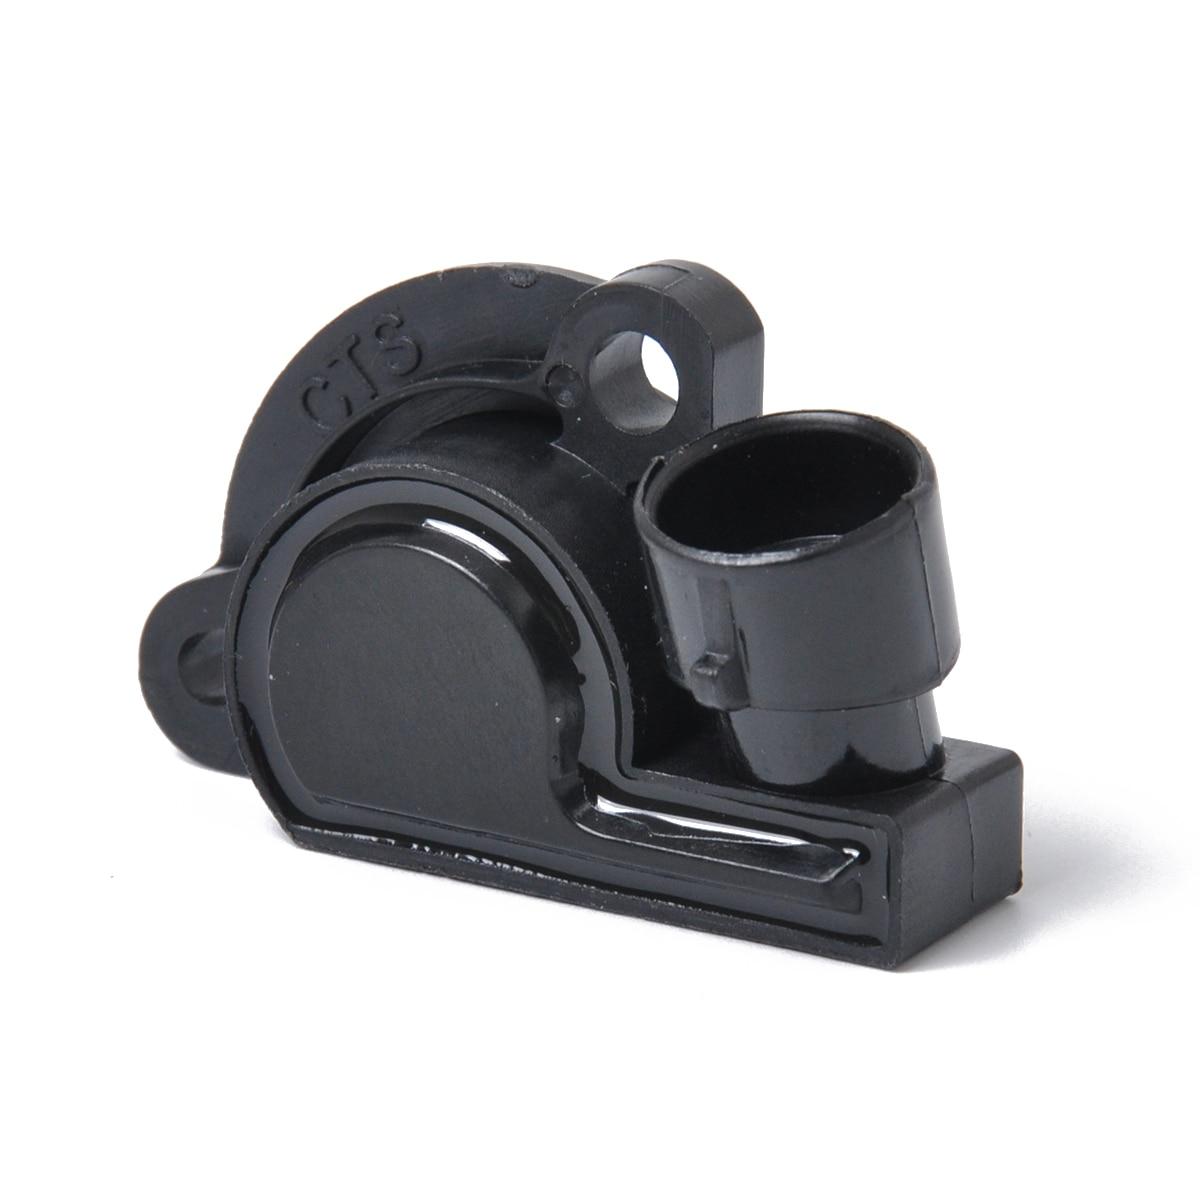 Auto Car TPS Throttle Position Sensor 94580175 For Chevrolet AVEO 1.6L L4 2009-2010 Year